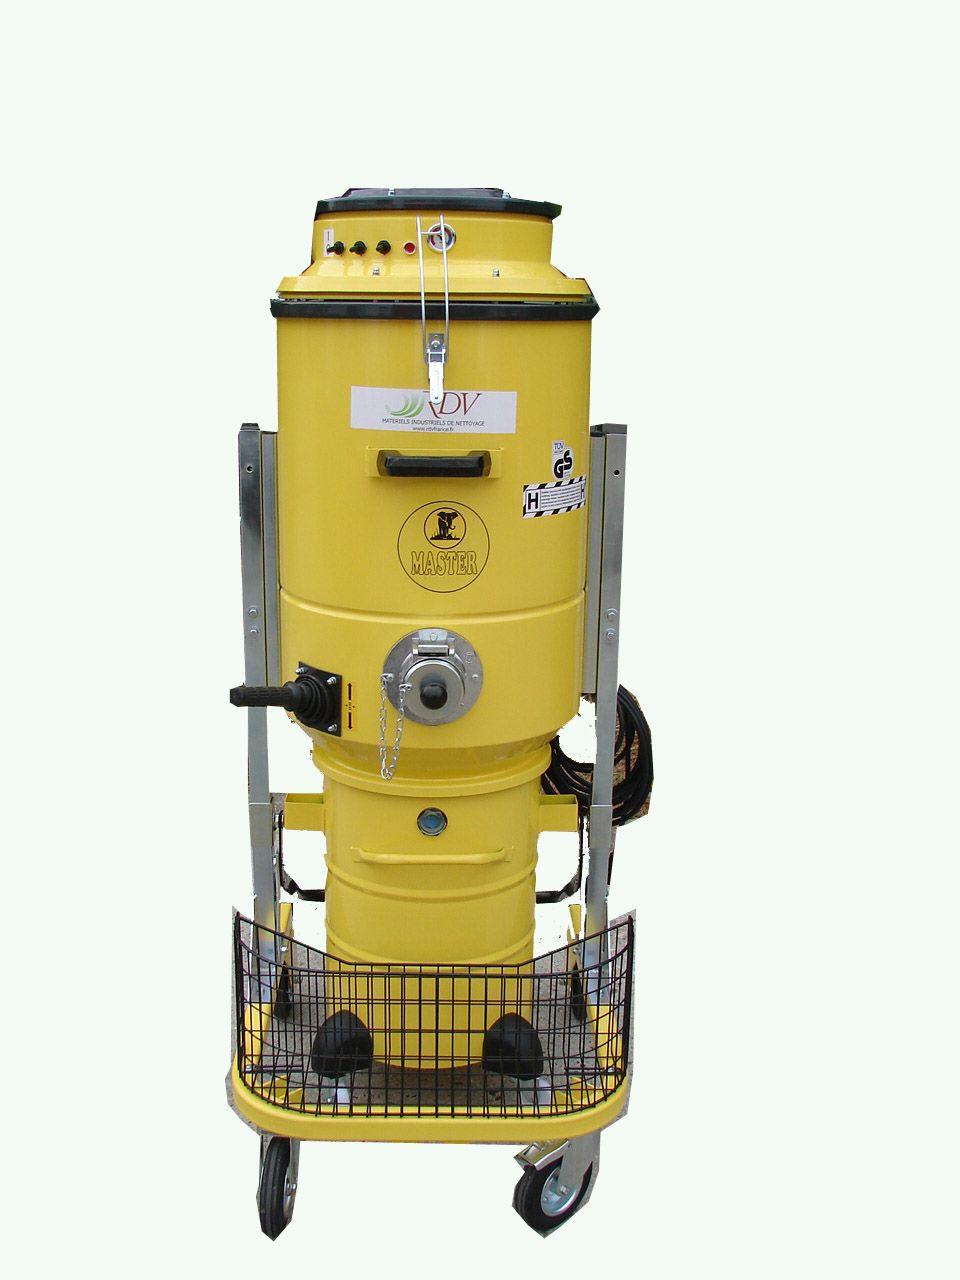 aspirateur m450tuvh aspirateur industriel filtre the. Black Bedroom Furniture Sets. Home Design Ideas